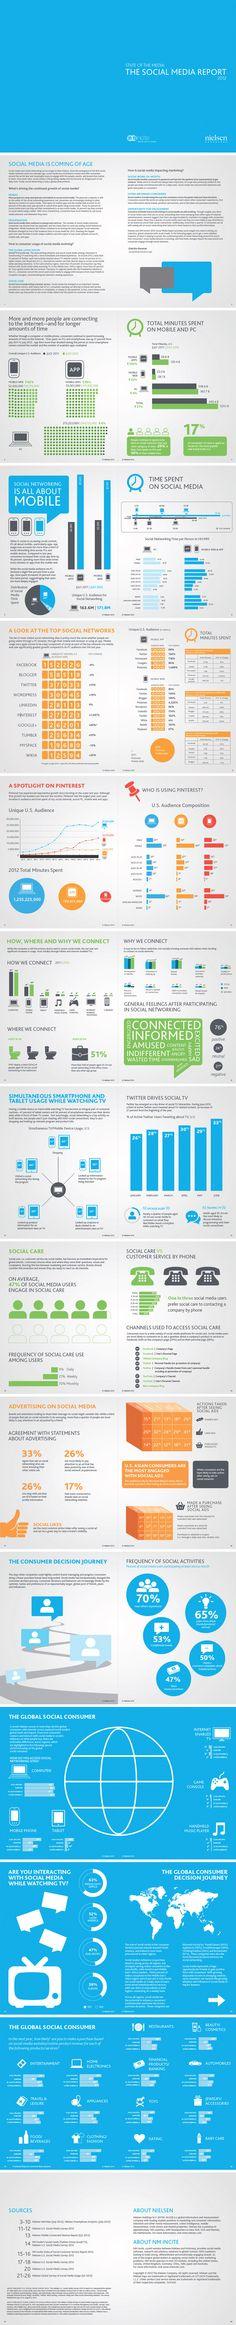 State of the media: the Social Media Report 2012 by #Nielsen. #infographic #smm #socialmedia